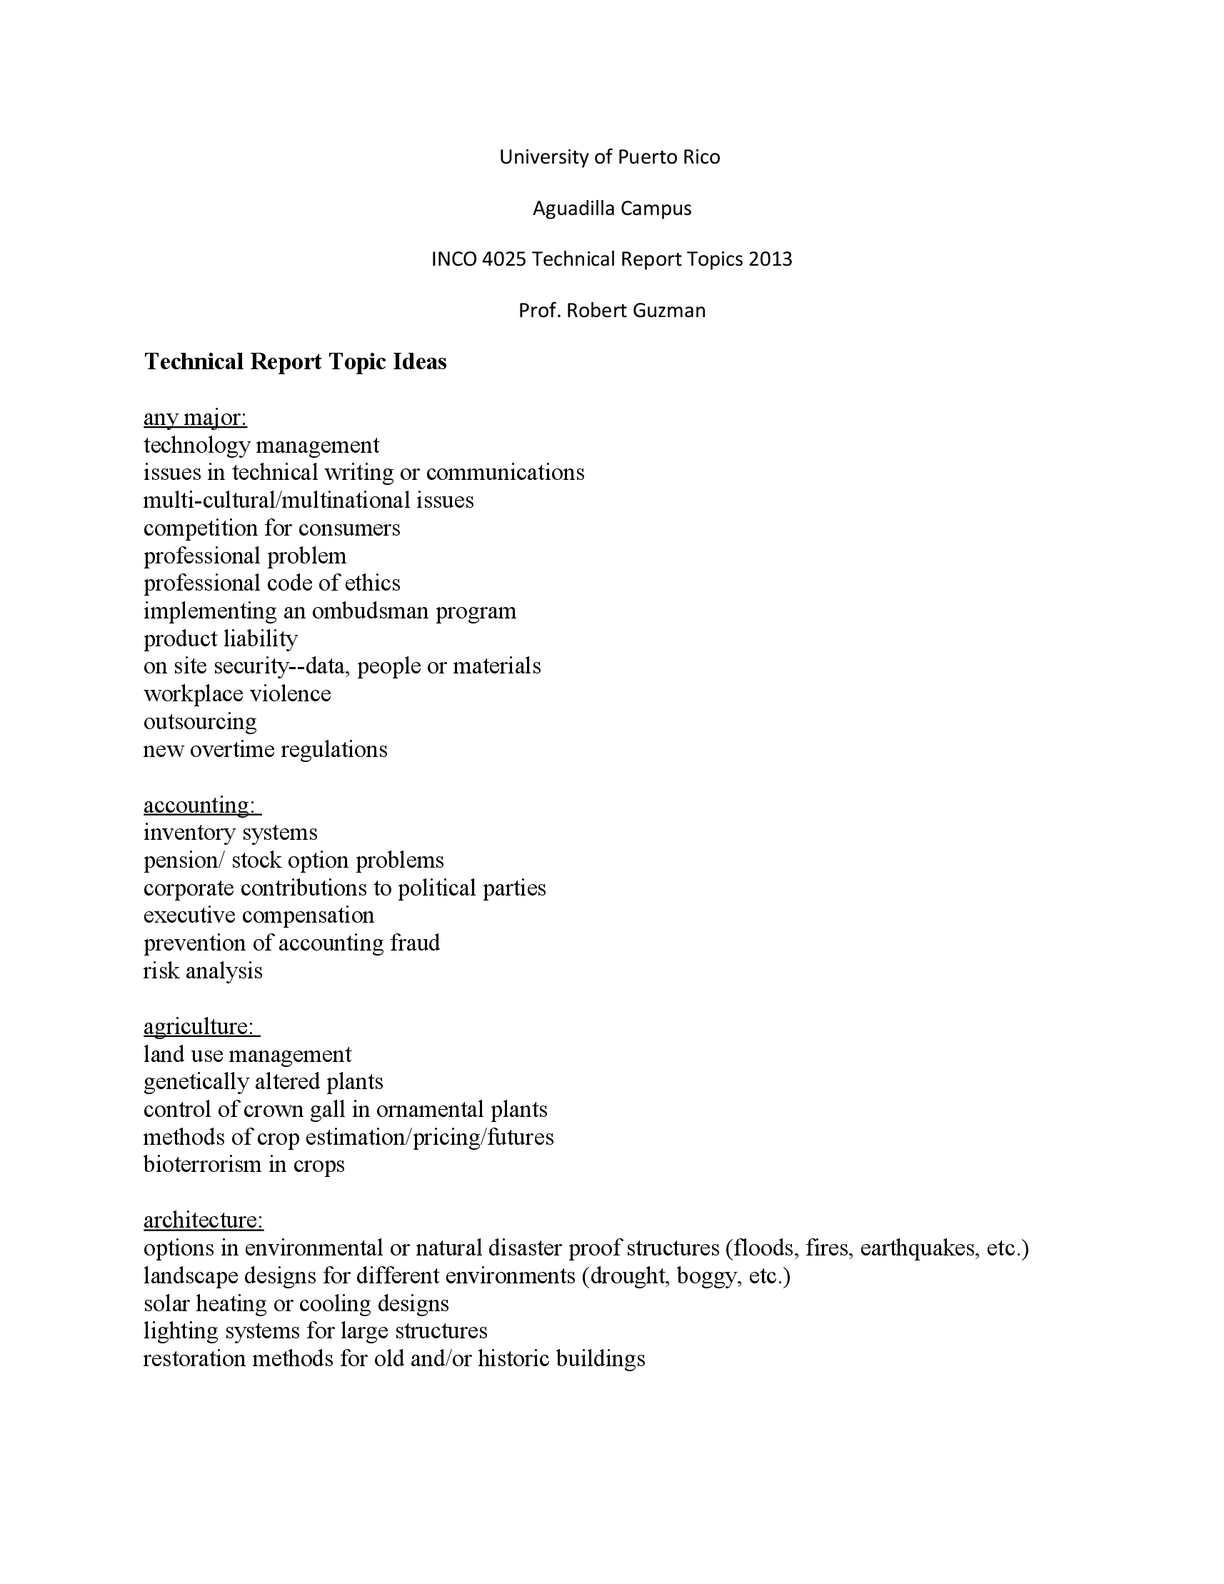 Calaméo - INCO 4025 Technical Report Topics 2013